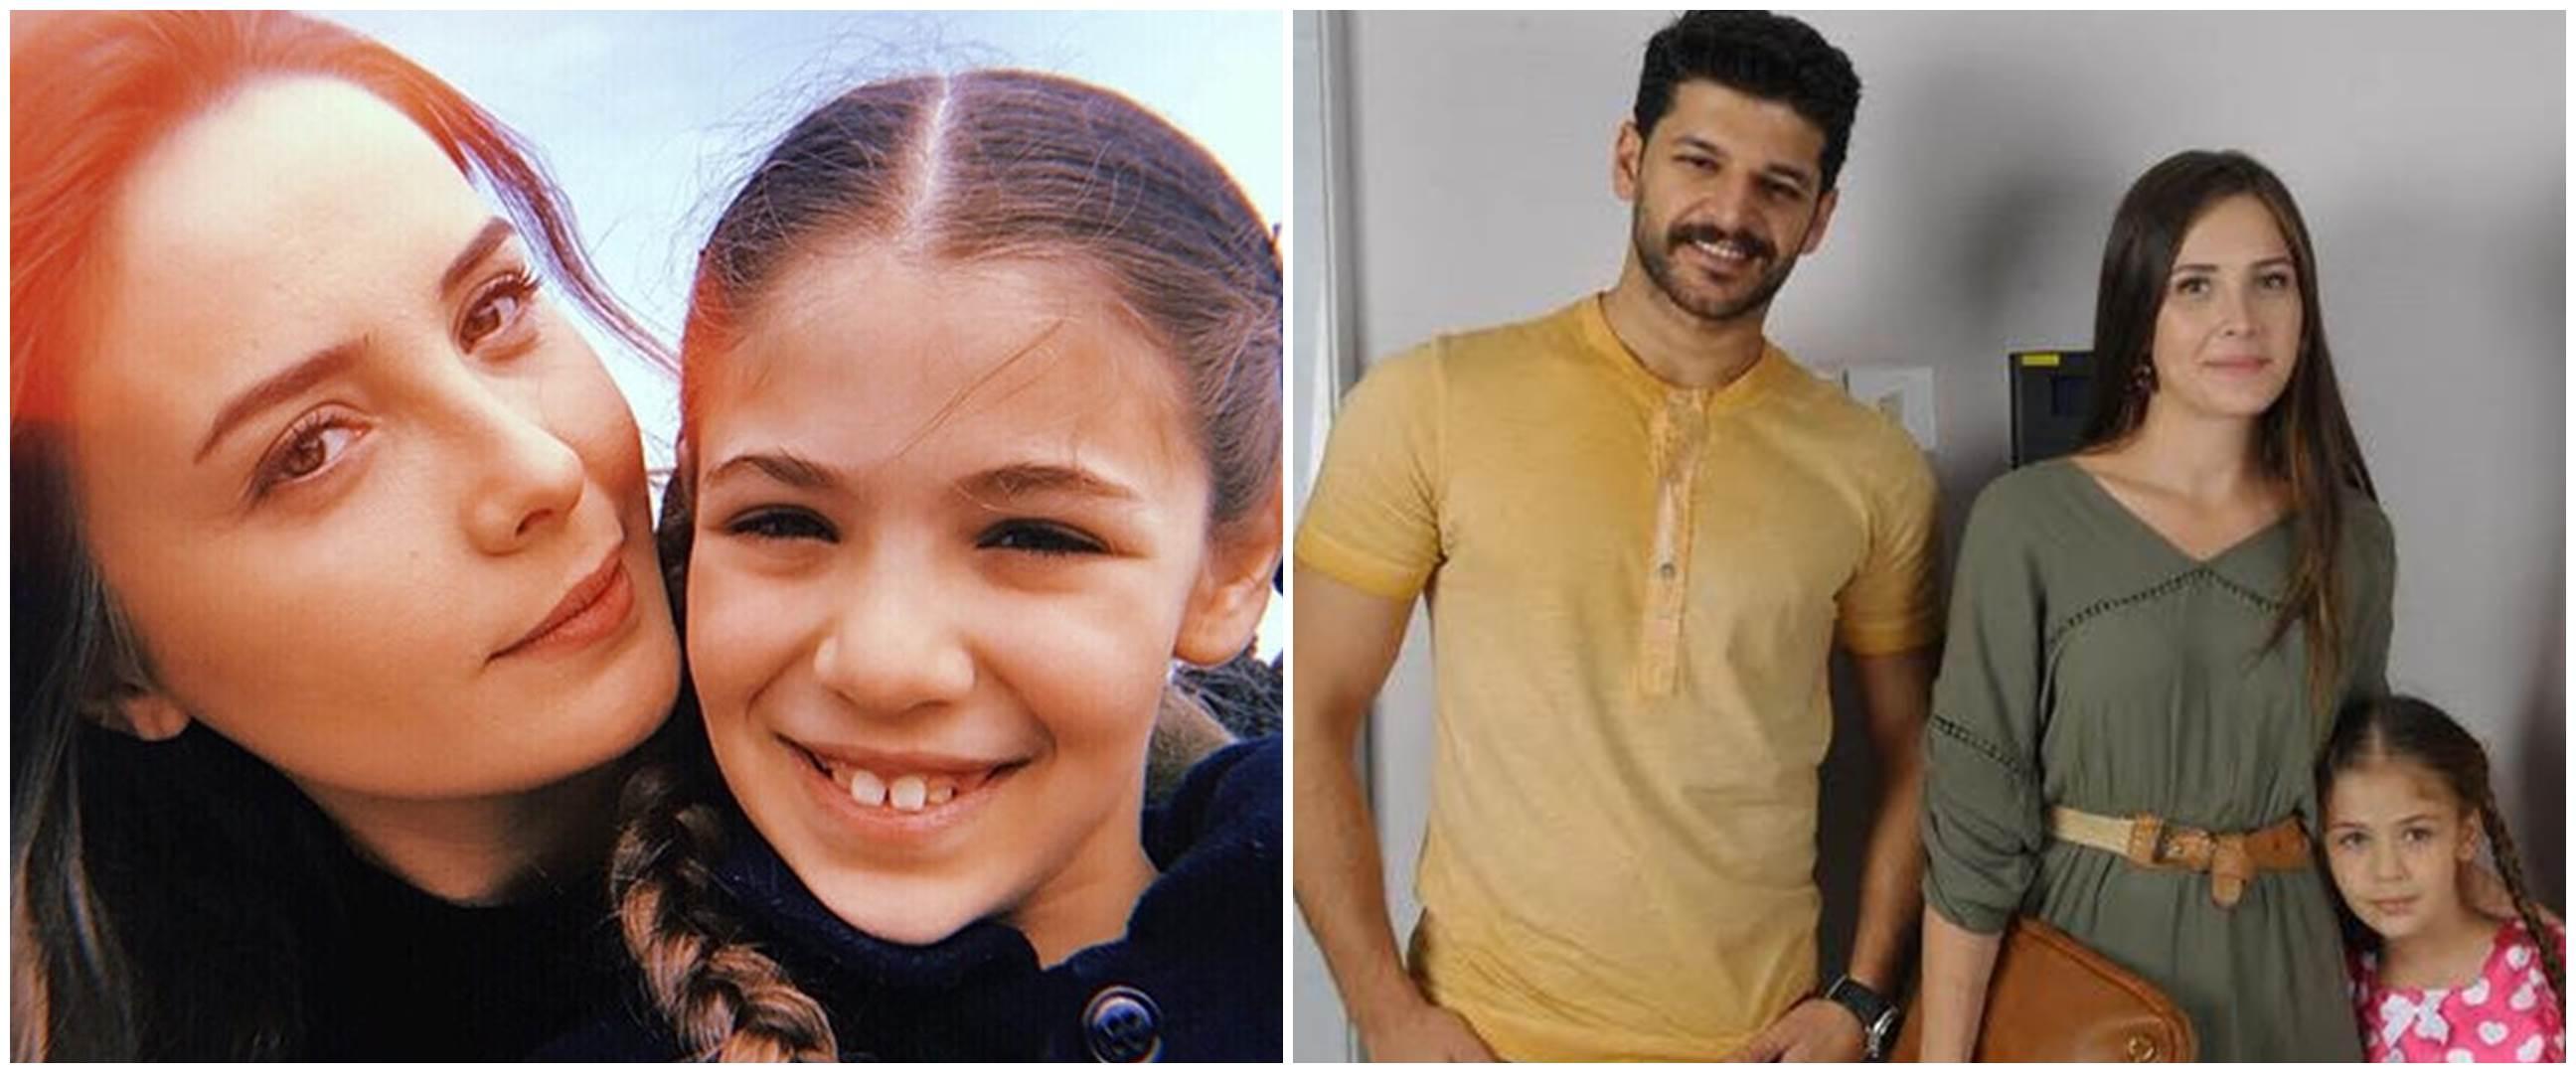 Ingat pemeran Melek di Drama Turki Elif? Ini 8 potret terbarunya